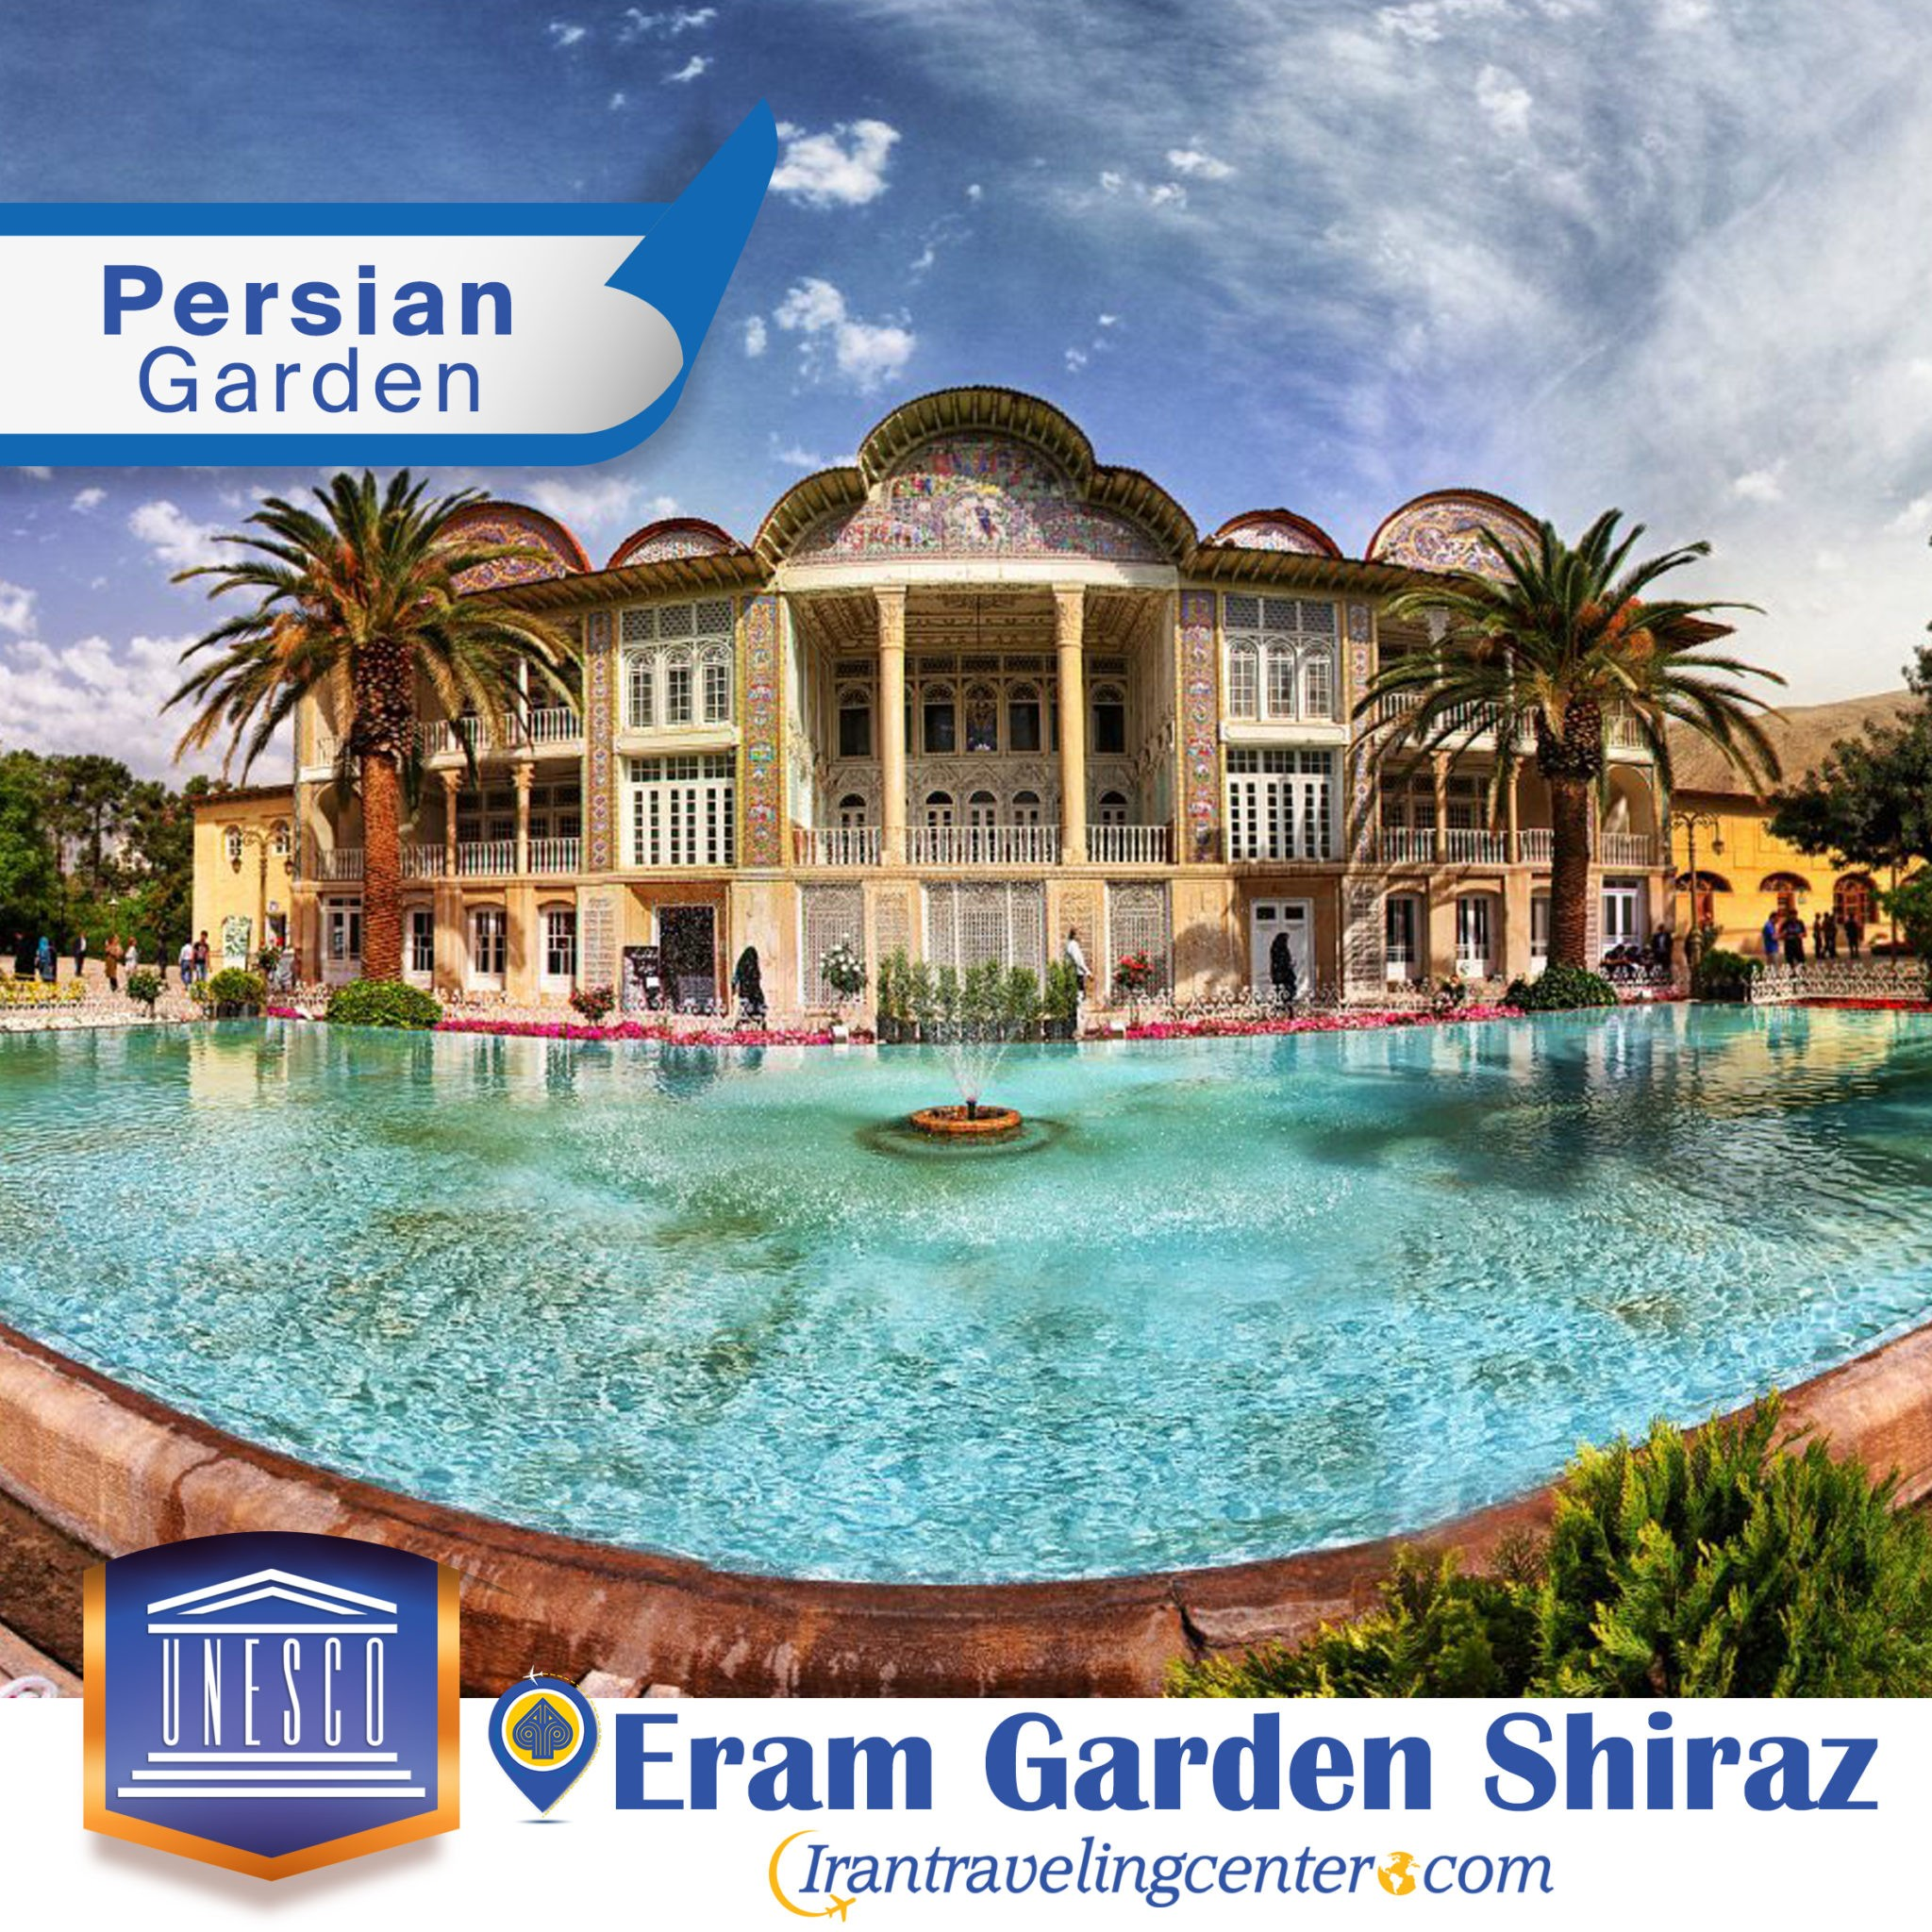 Eram Garden-Persian garden